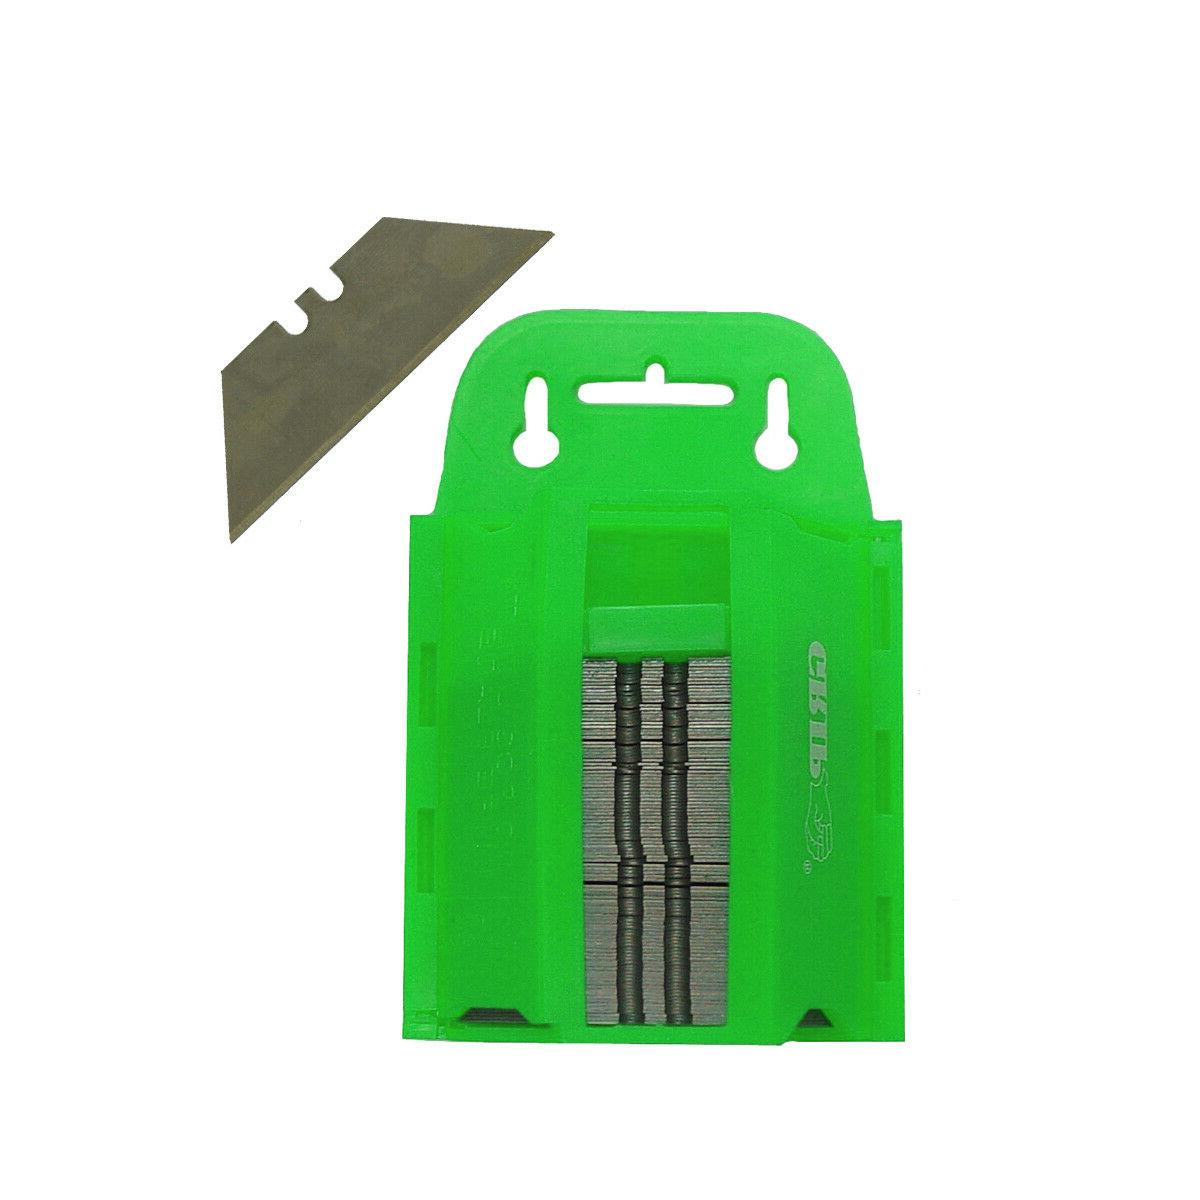 100pc utility knife blades razor blades box